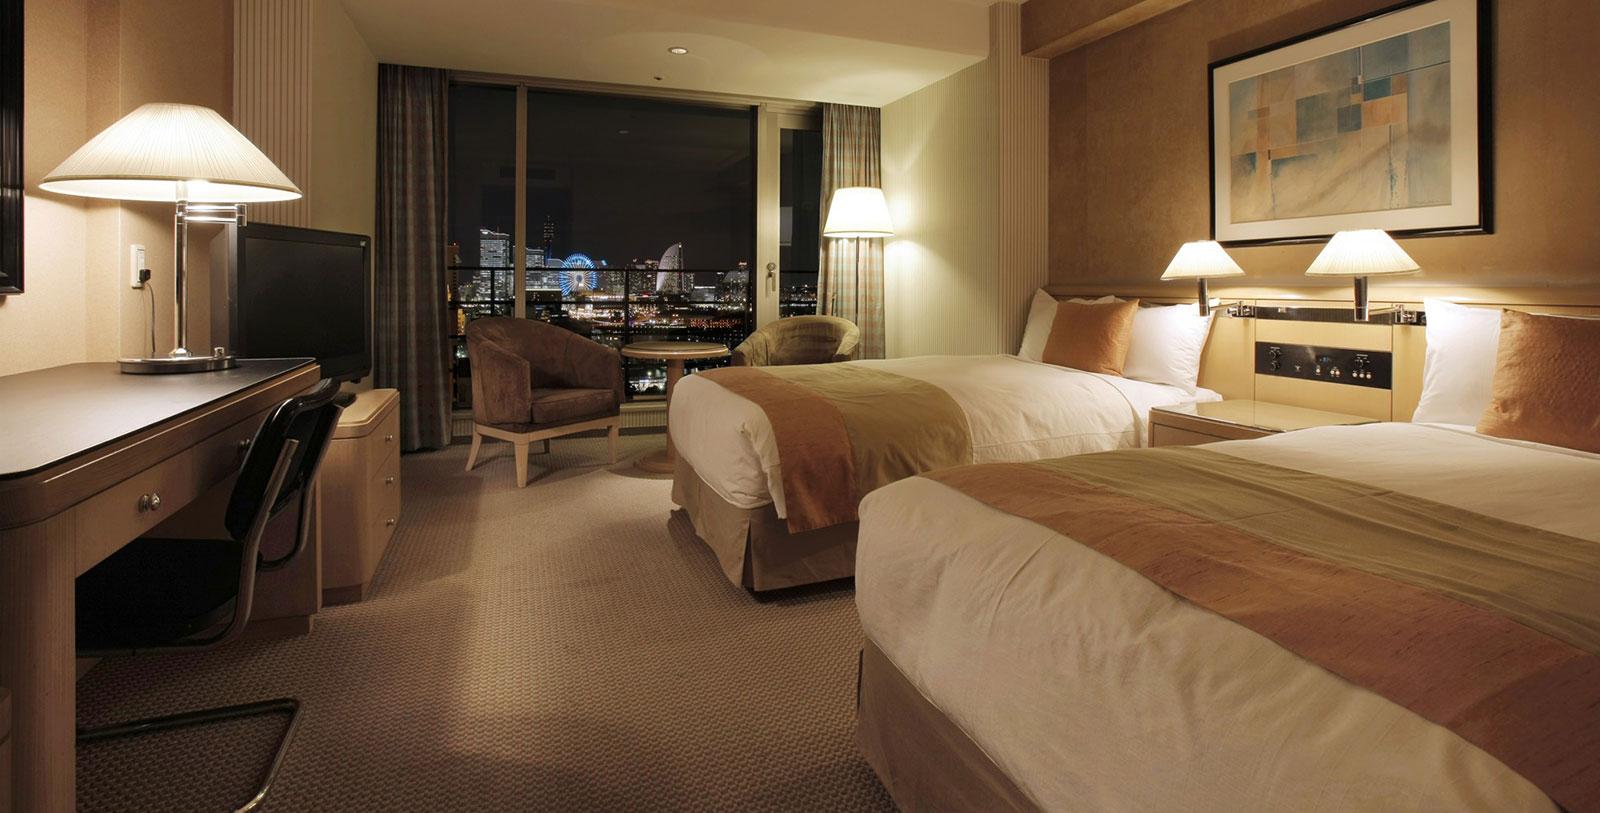 Image of Guestroom Interior, Hotel New Grand, Yokohama, Japan, 1927, Member of Historic Hotels Worldwide, Accommodations